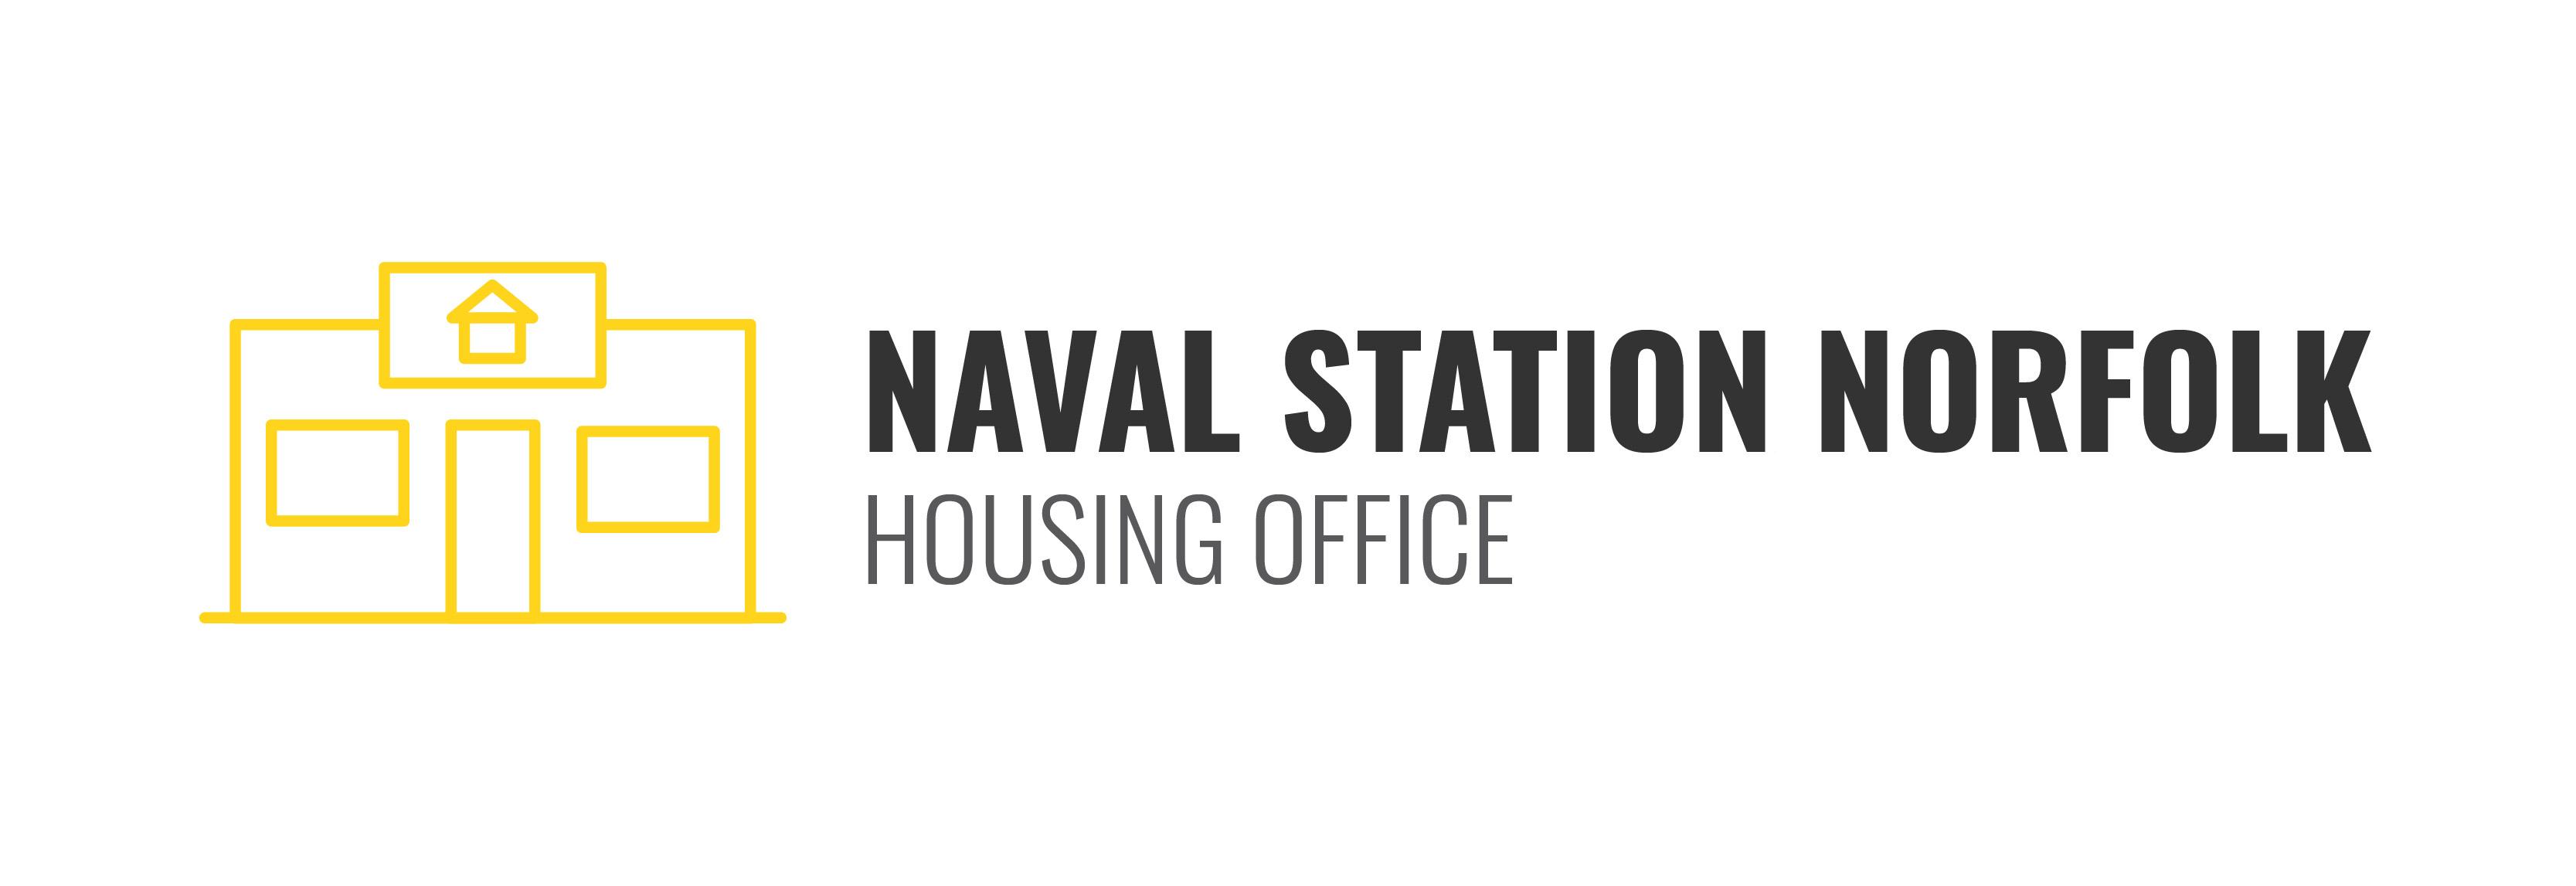 Naval Station Norfolk Housing Office